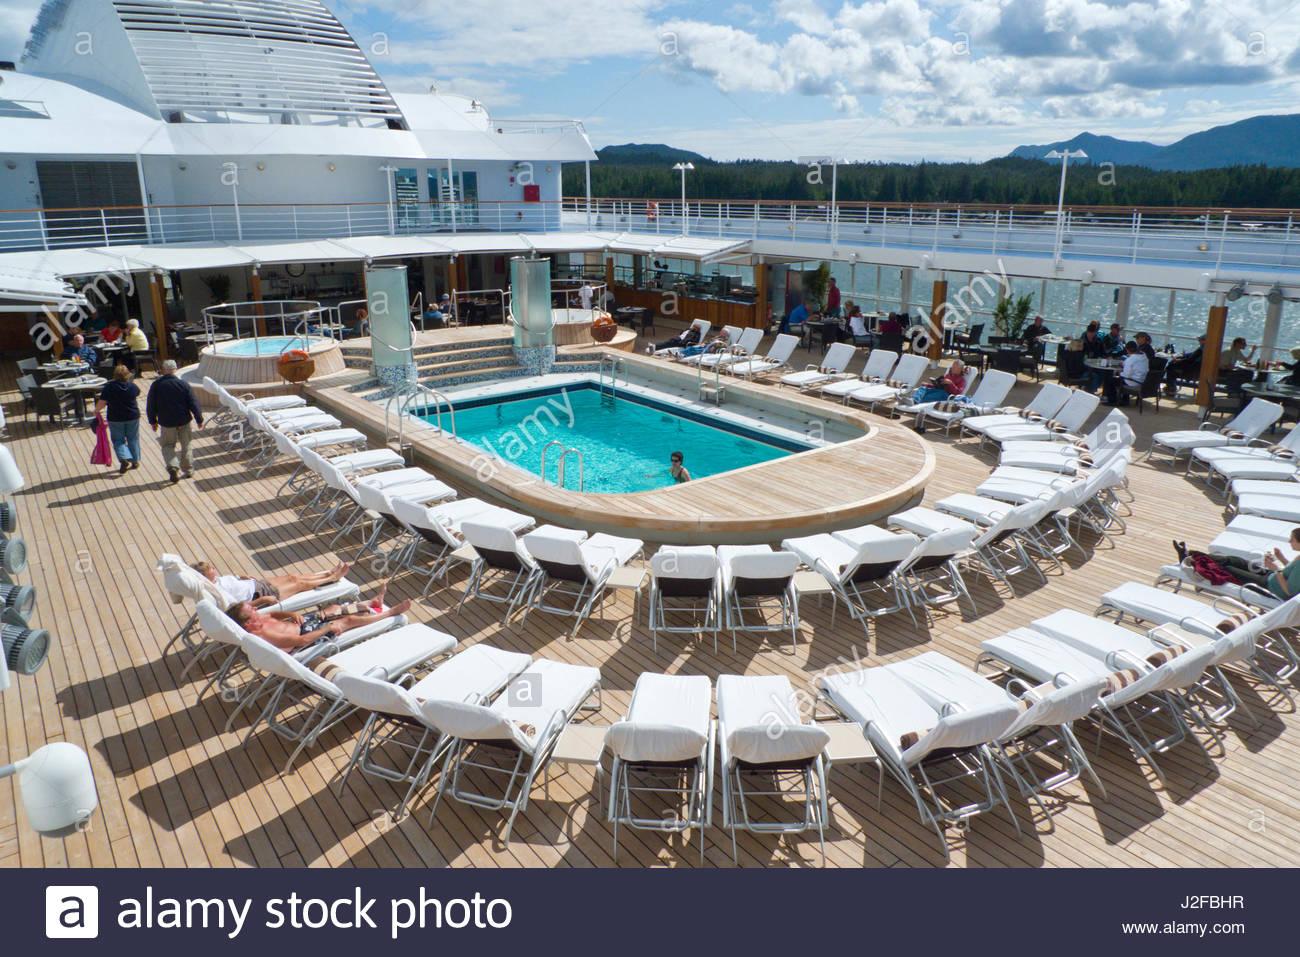 Lounge chairs around pool on the Regency Seven Seas Navigator Cruise Ship docked at Ketchikan harbor, Alaska, USA - Stock Image